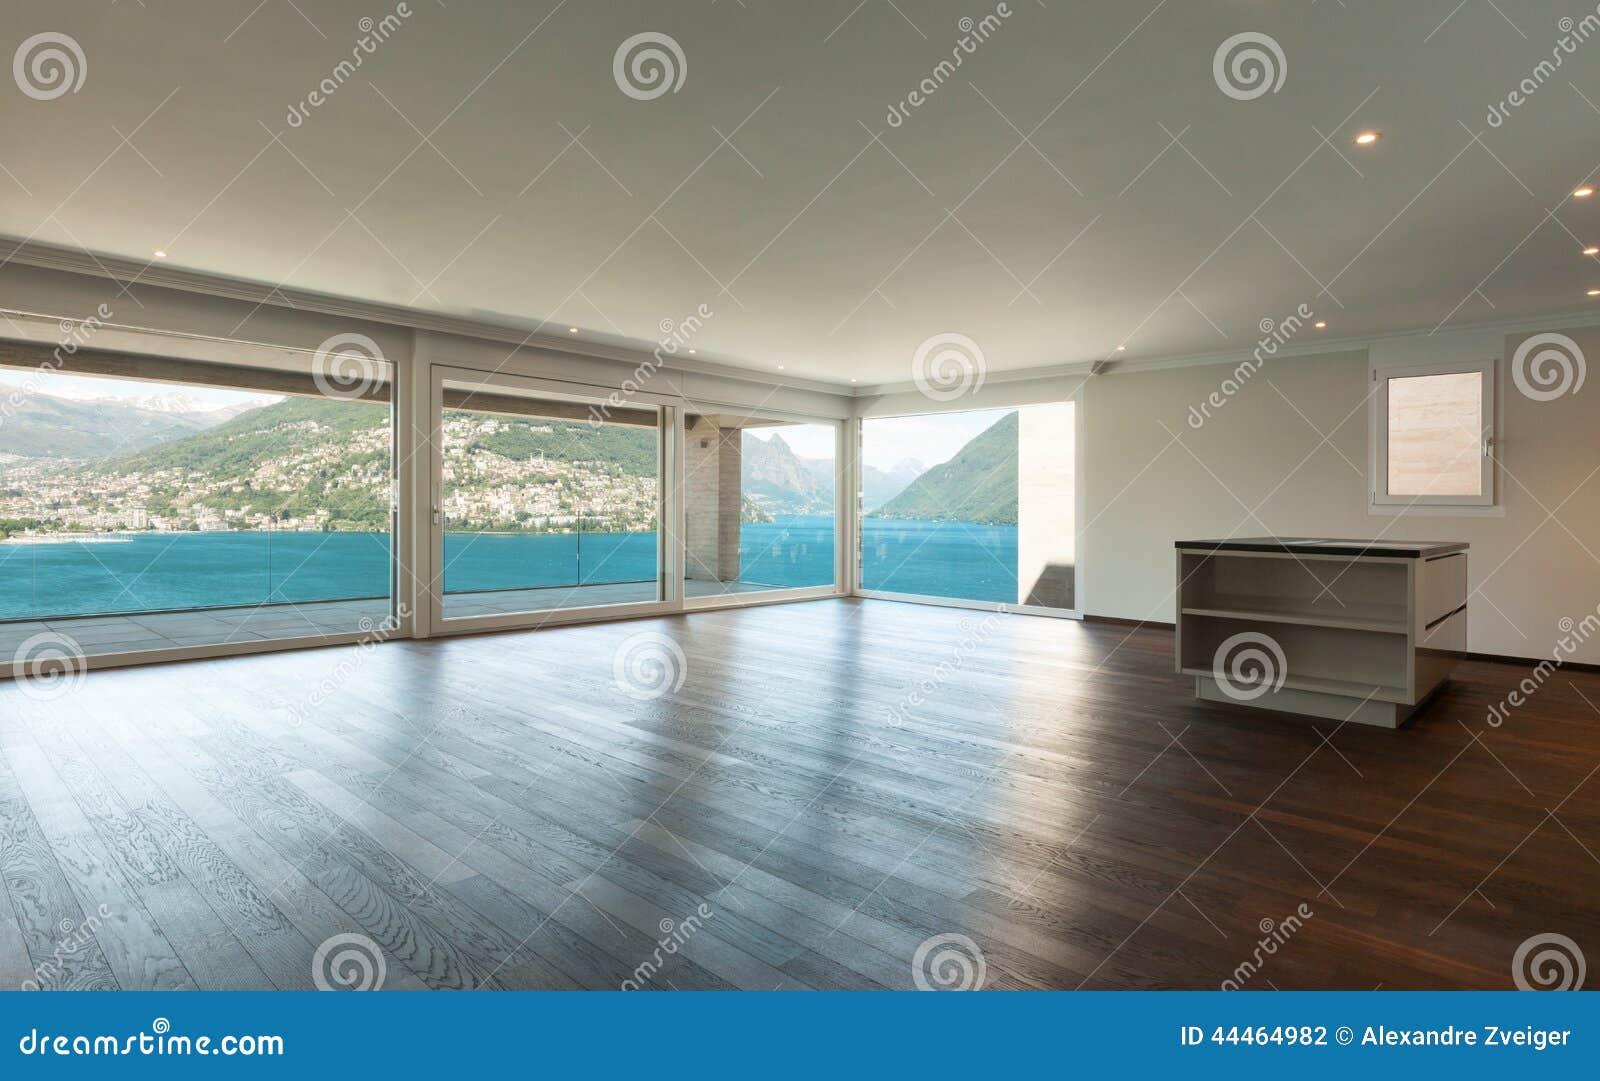 sch nes modernes haus innen stockfoto bild 44464982. Black Bedroom Furniture Sets. Home Design Ideas